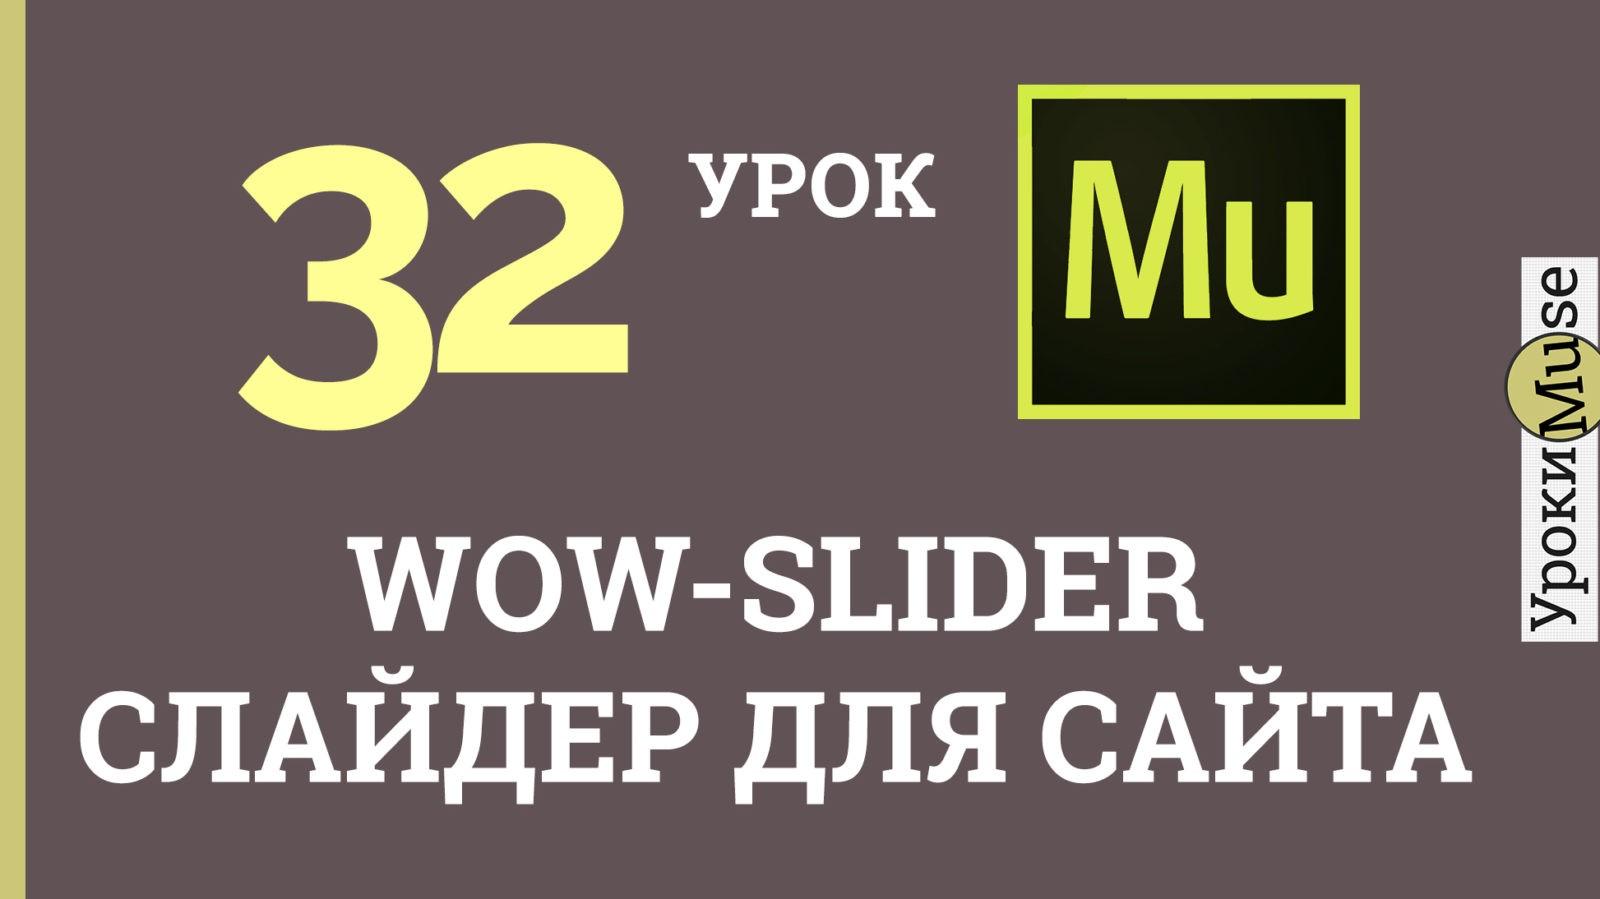 WOW-SLIDER Слайдер для сайта